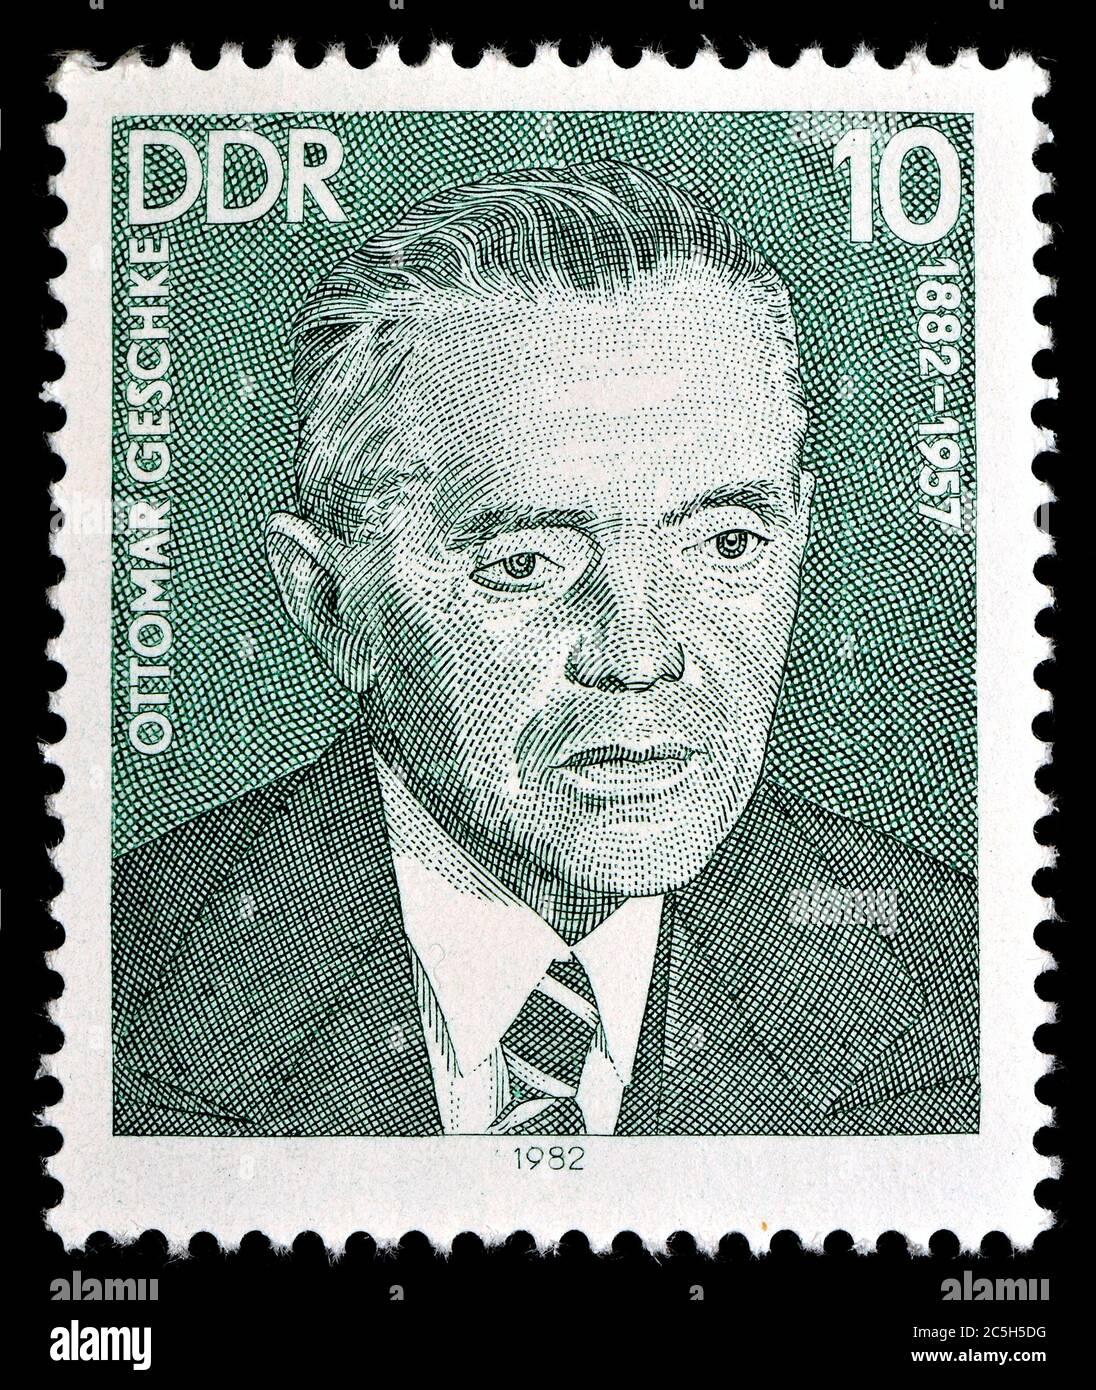 Francobollo tedesco orientale (1982) : Ottomar Georg Alexander Geschke (1882-1957) politico tedesco (KPD, SED). Foto Stock